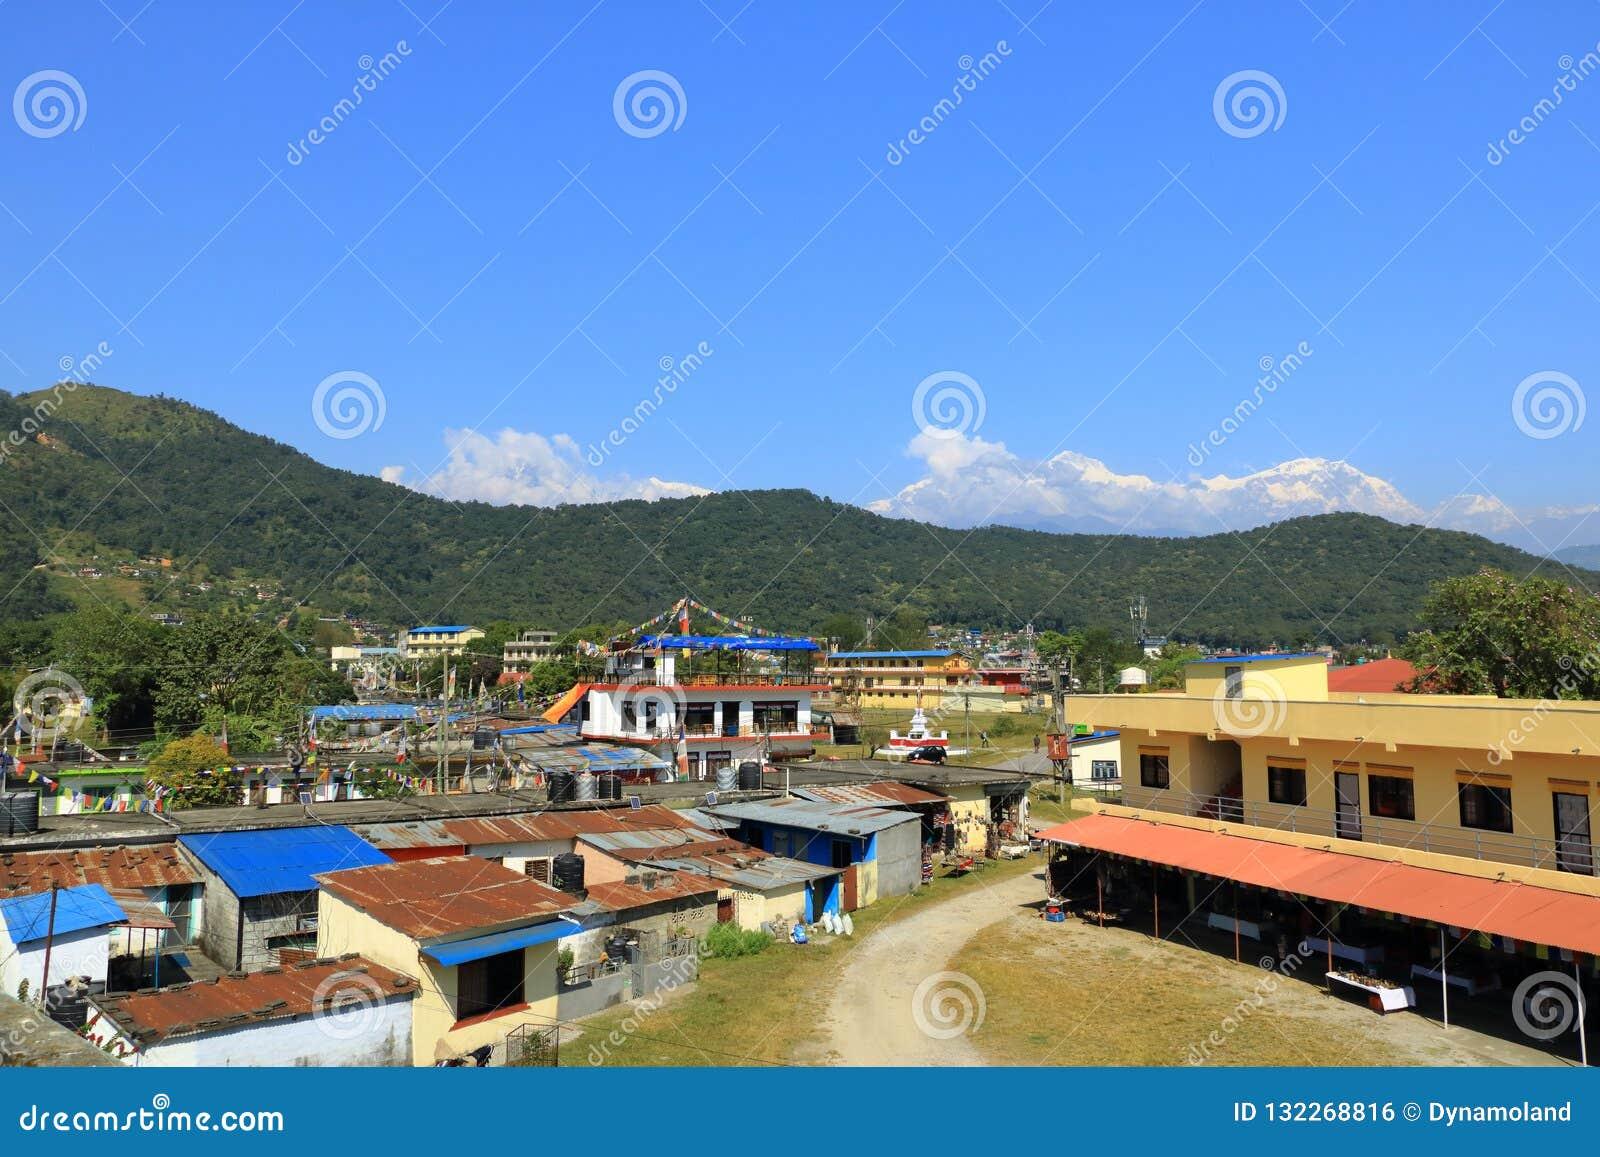 View At Annapurna Mountain Range From Pokhara, Nepal Stock ...